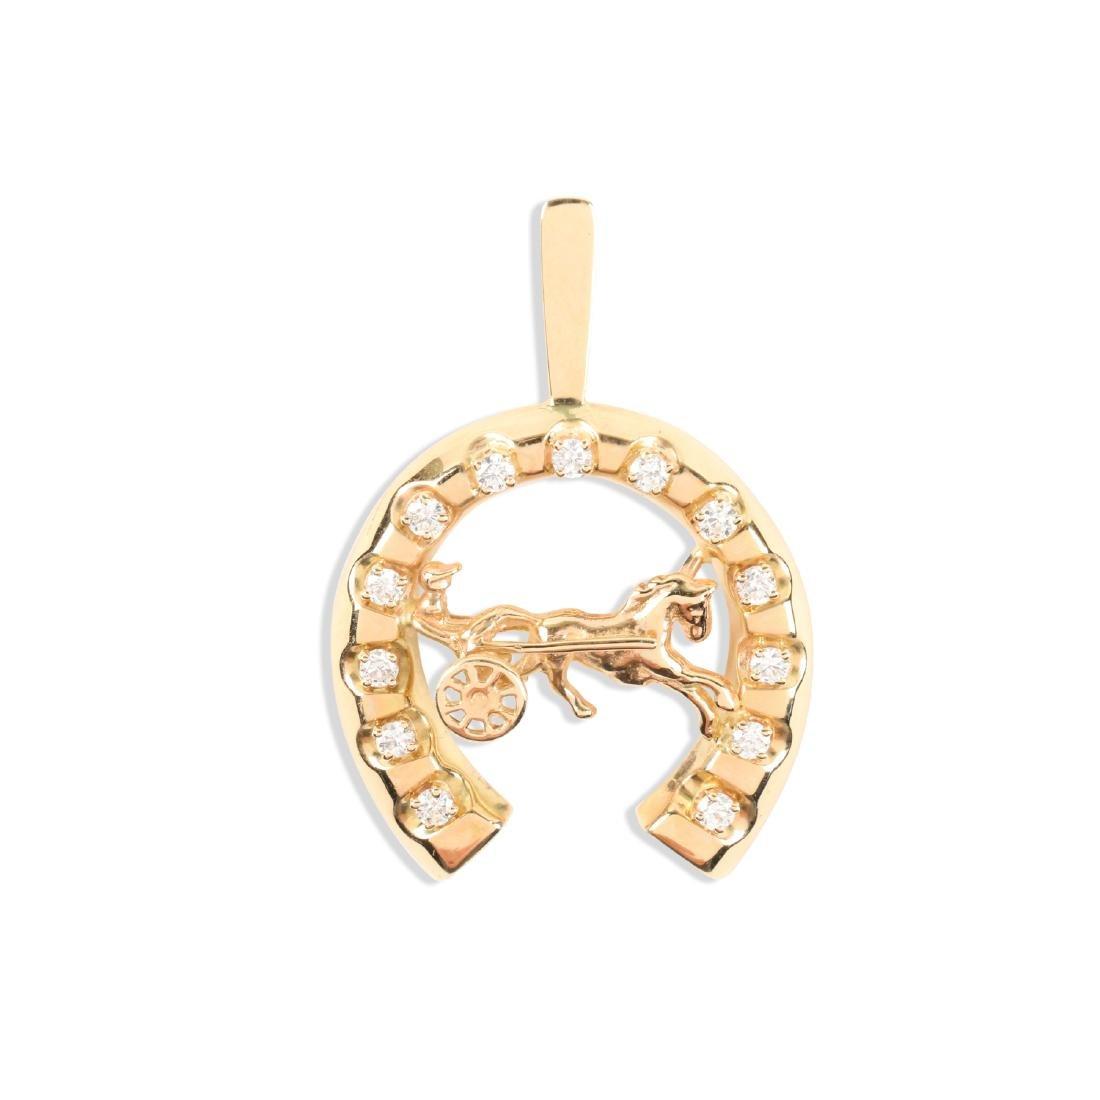 A 14K Gold & Diamond Jockey Pendant